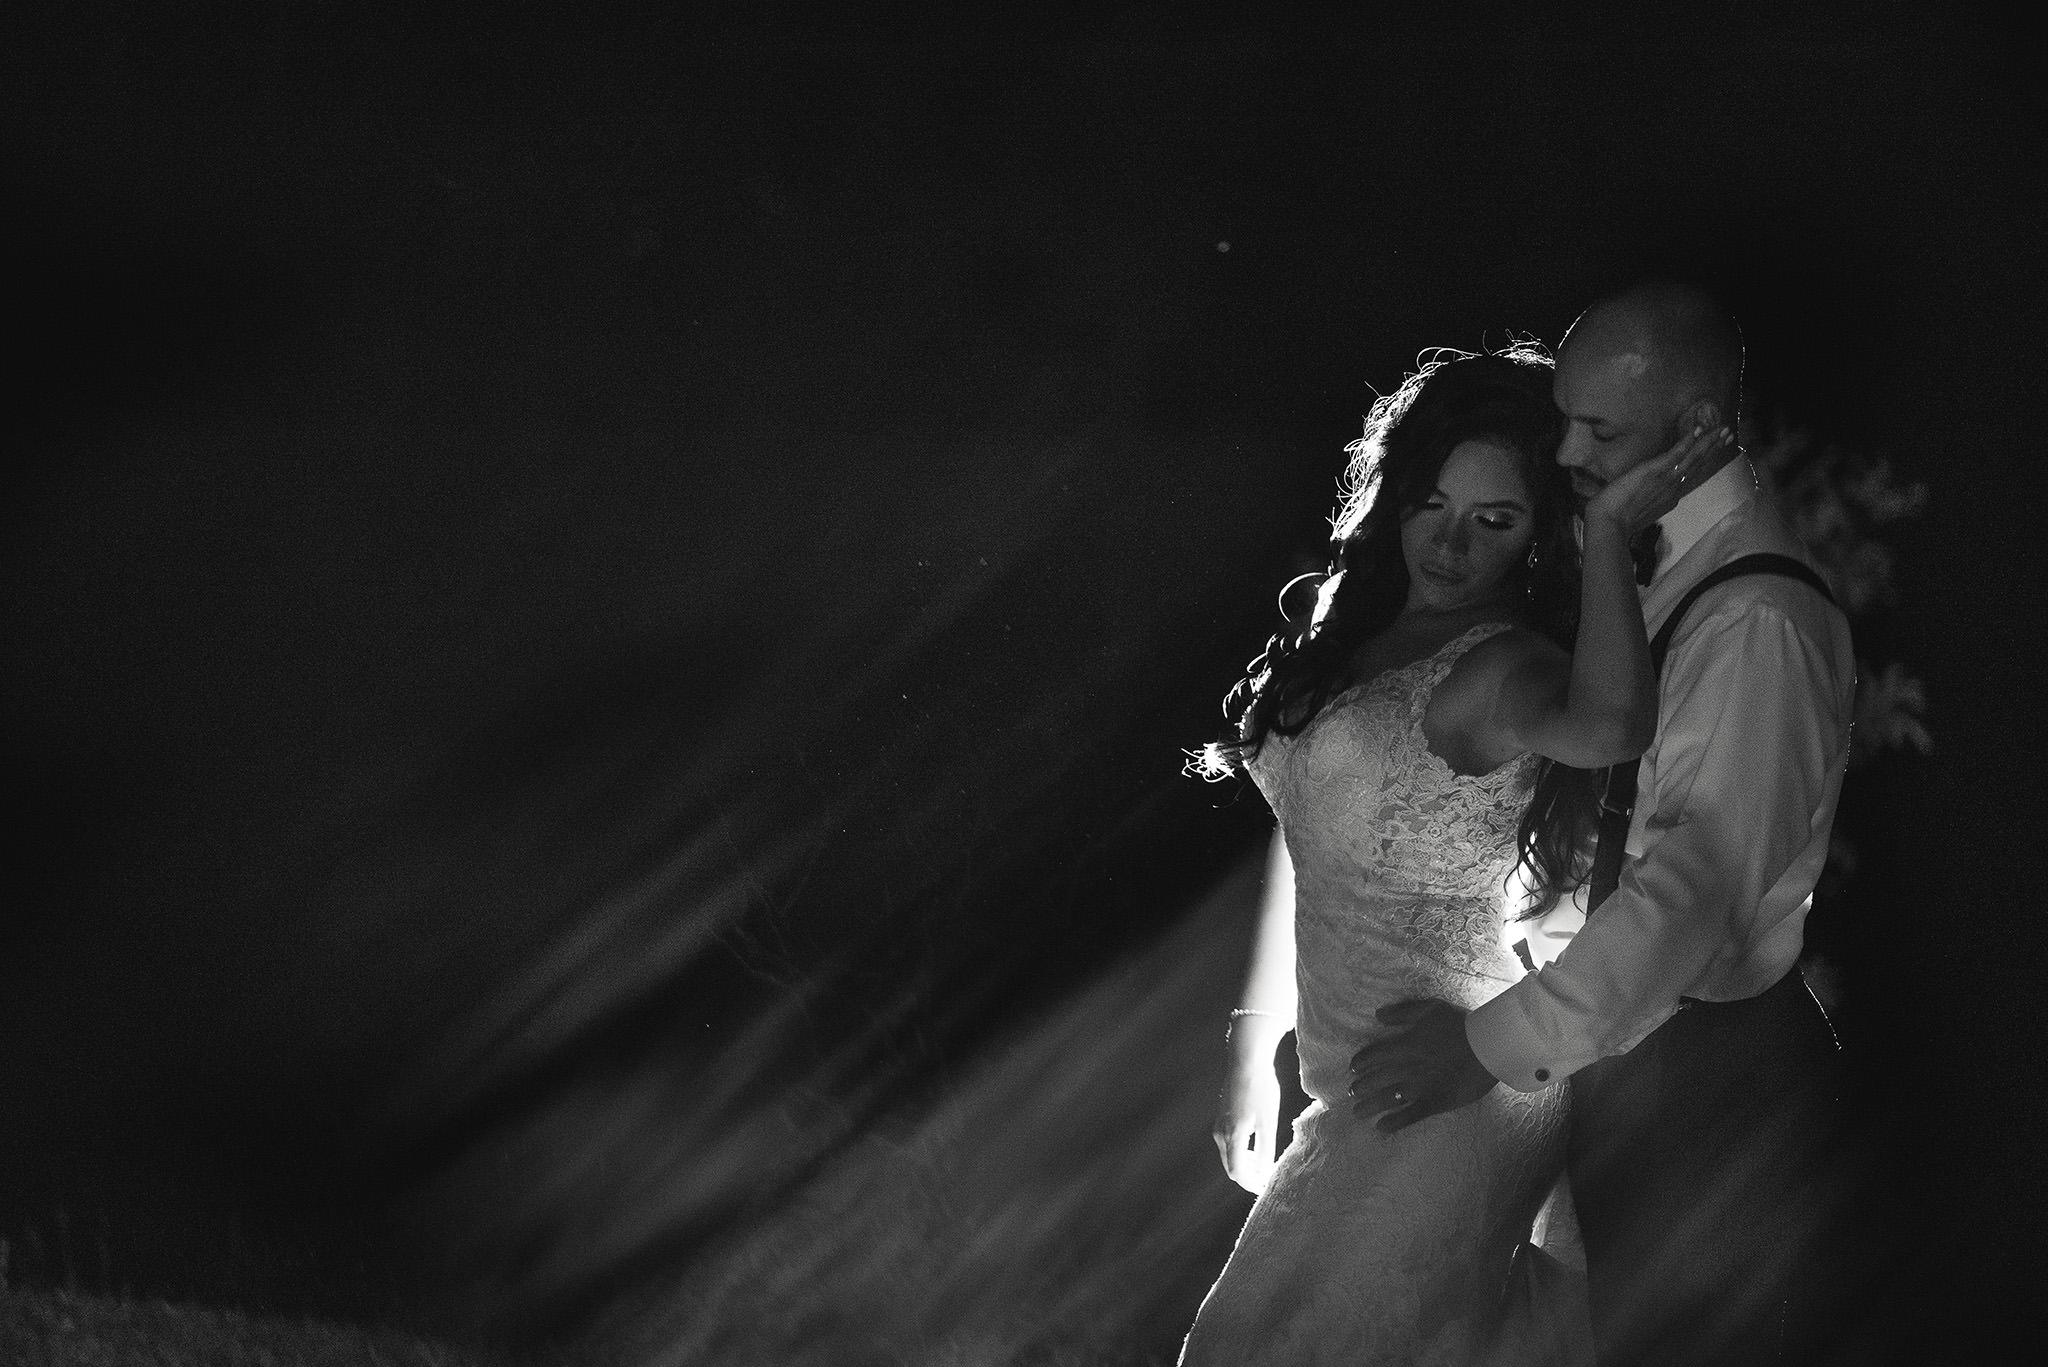 Mia-BellaVita-Tomball-Houston-classy-elegant-wedding-photographer